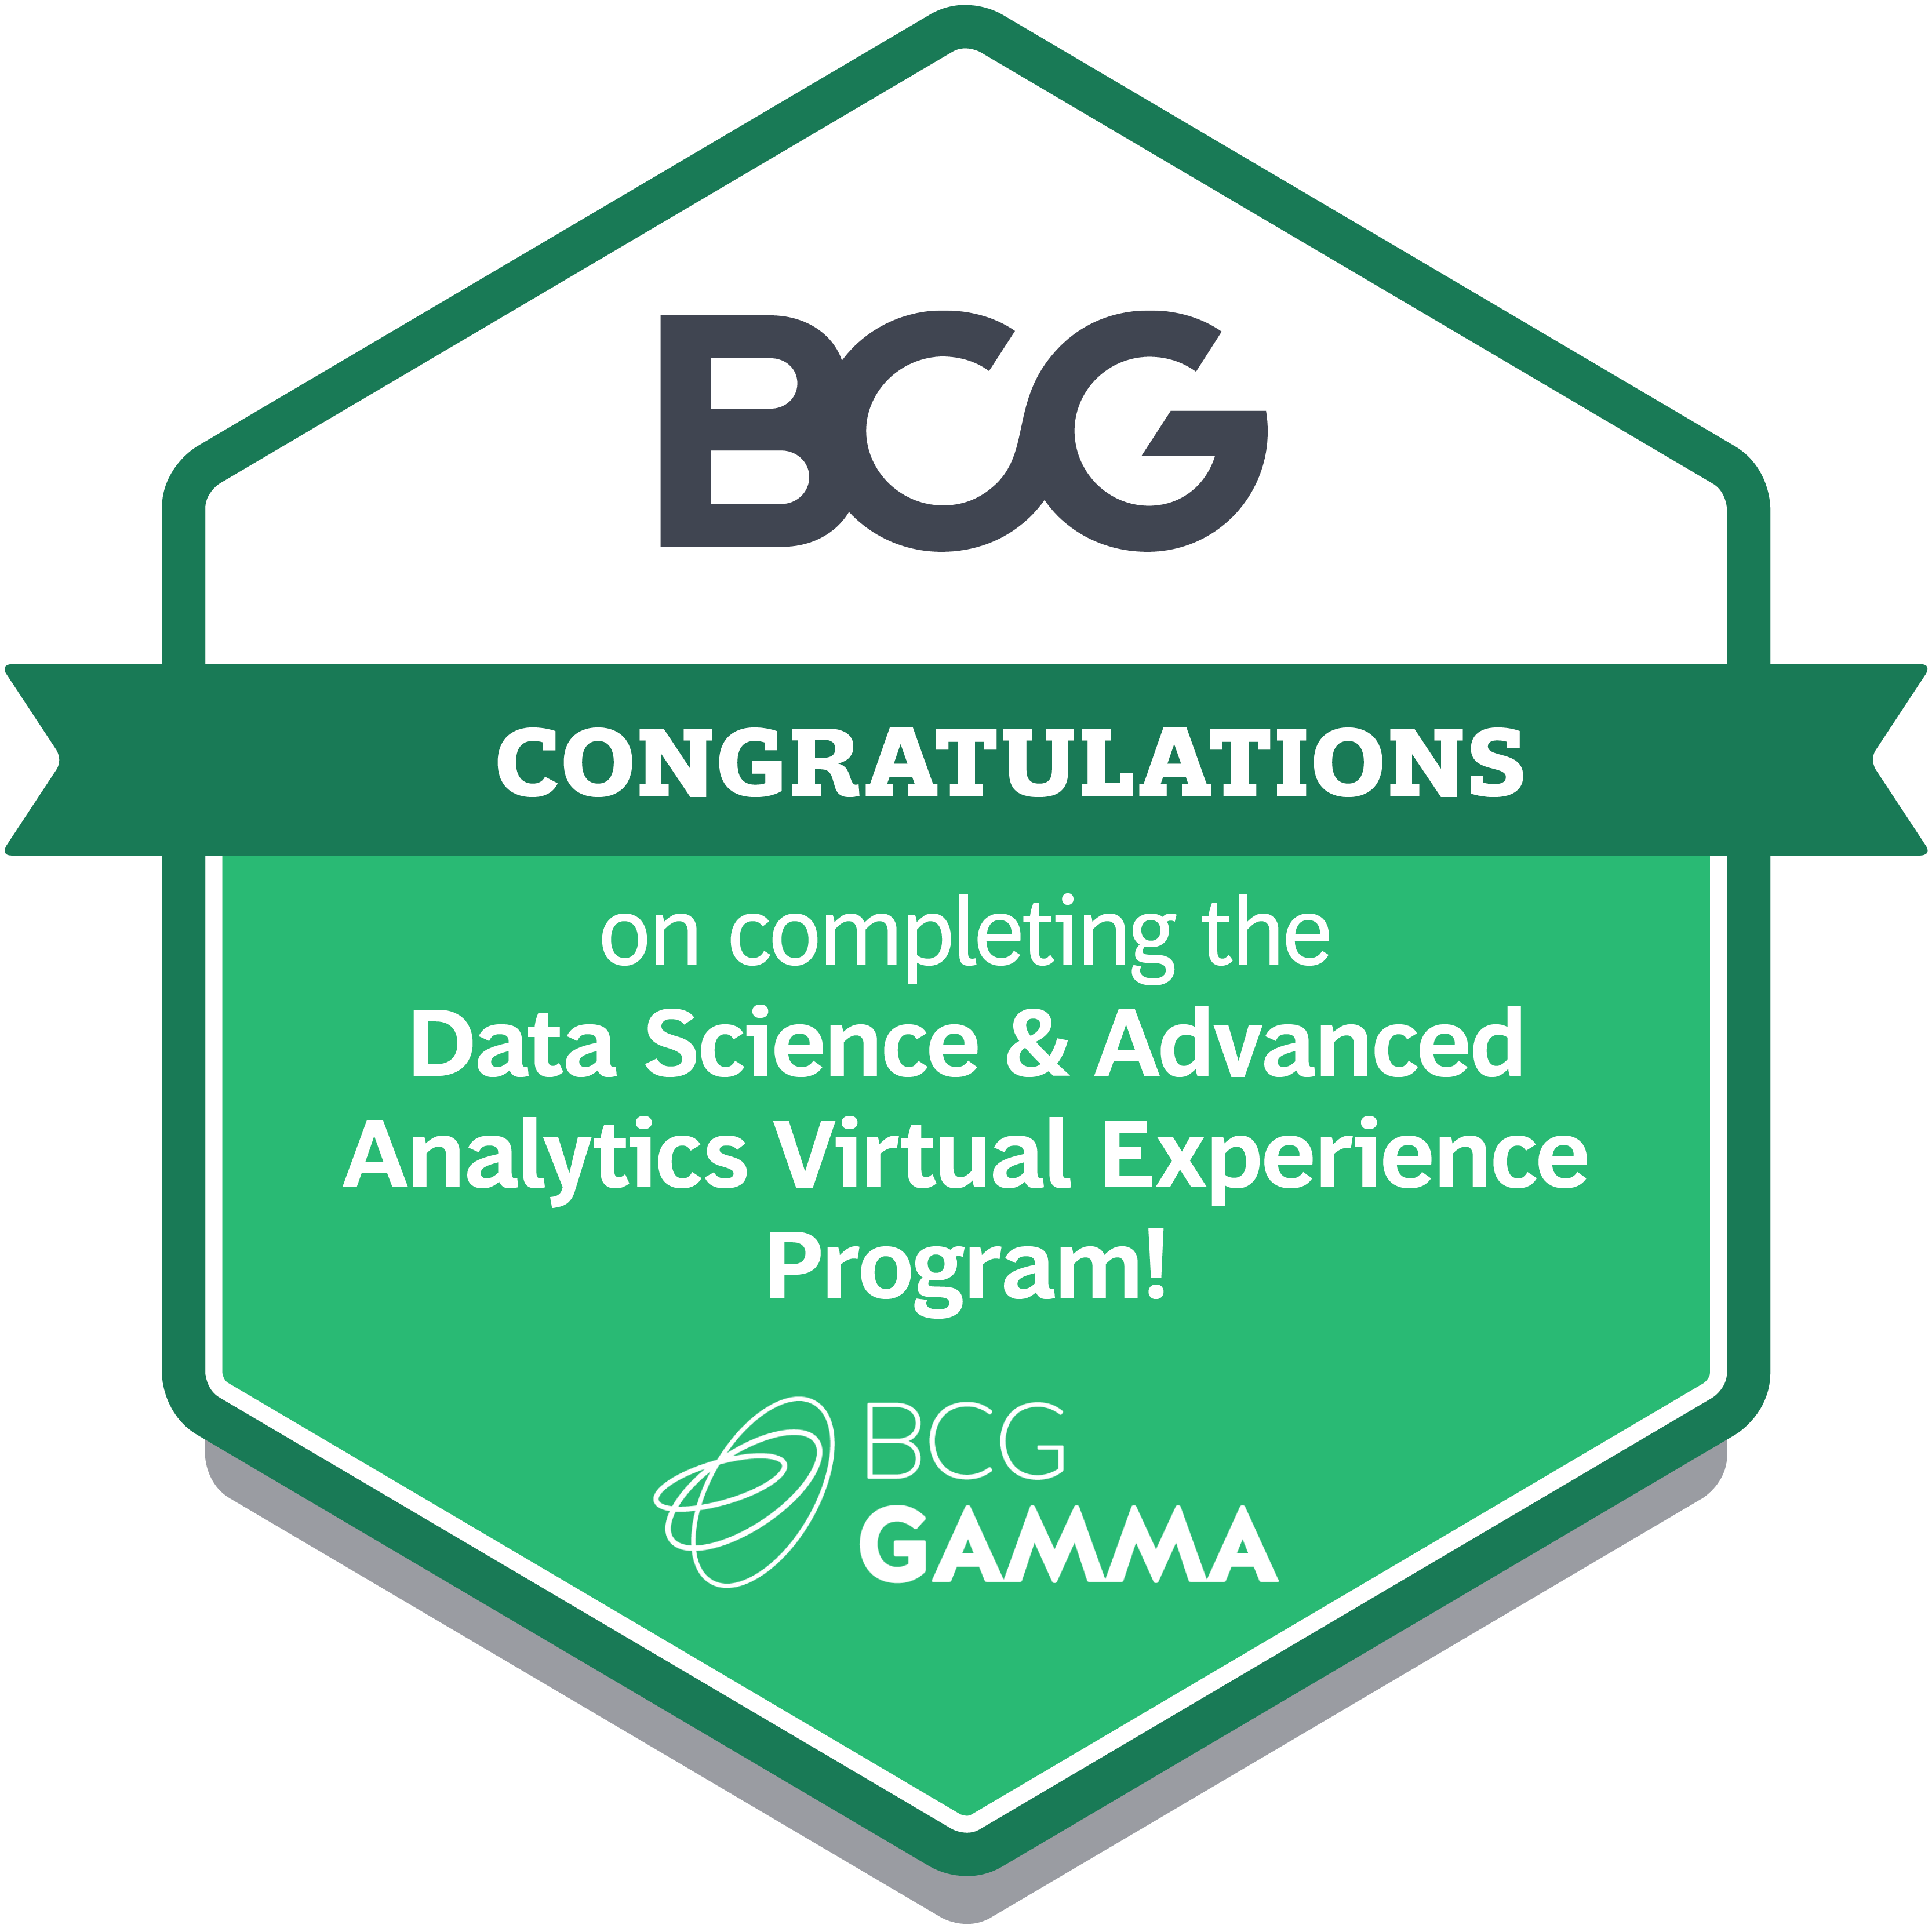 Open-Access Data Science & Advanced Analytics Virtual Experience Program